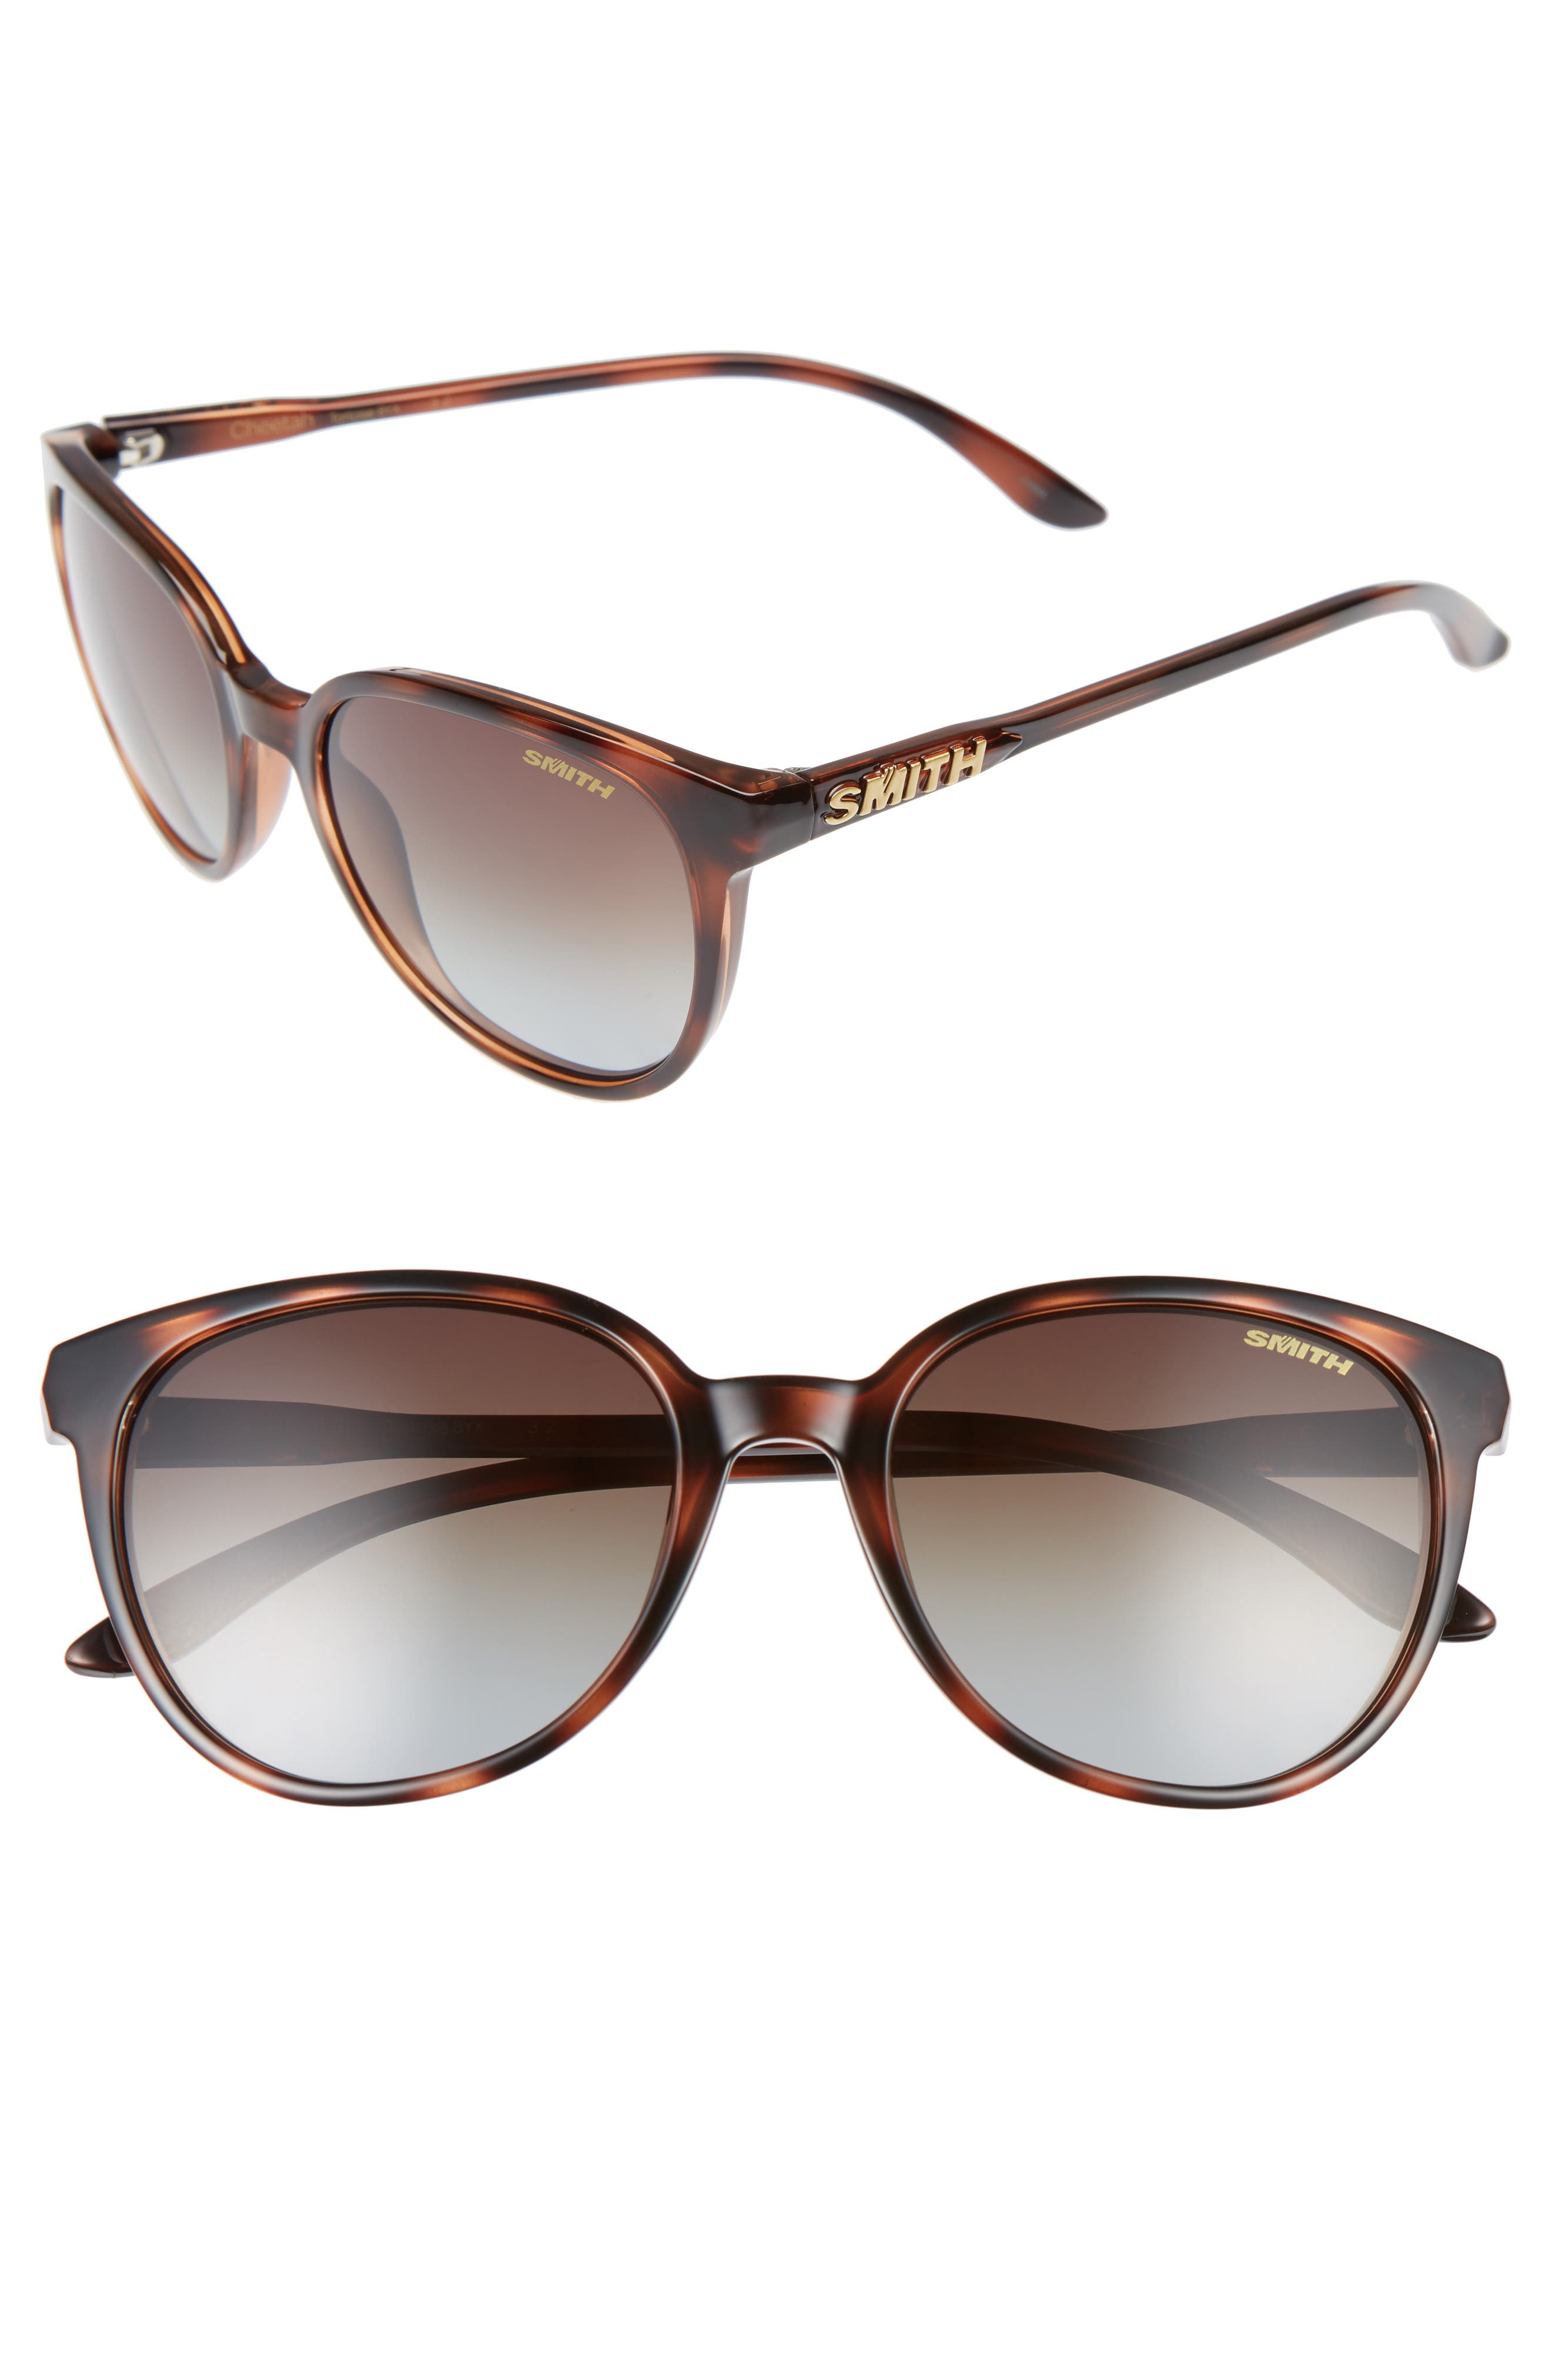 Cheetah 54mm Polarized Sunglasses,                             Alternate thumbnail 2, color,                             TORTOISE